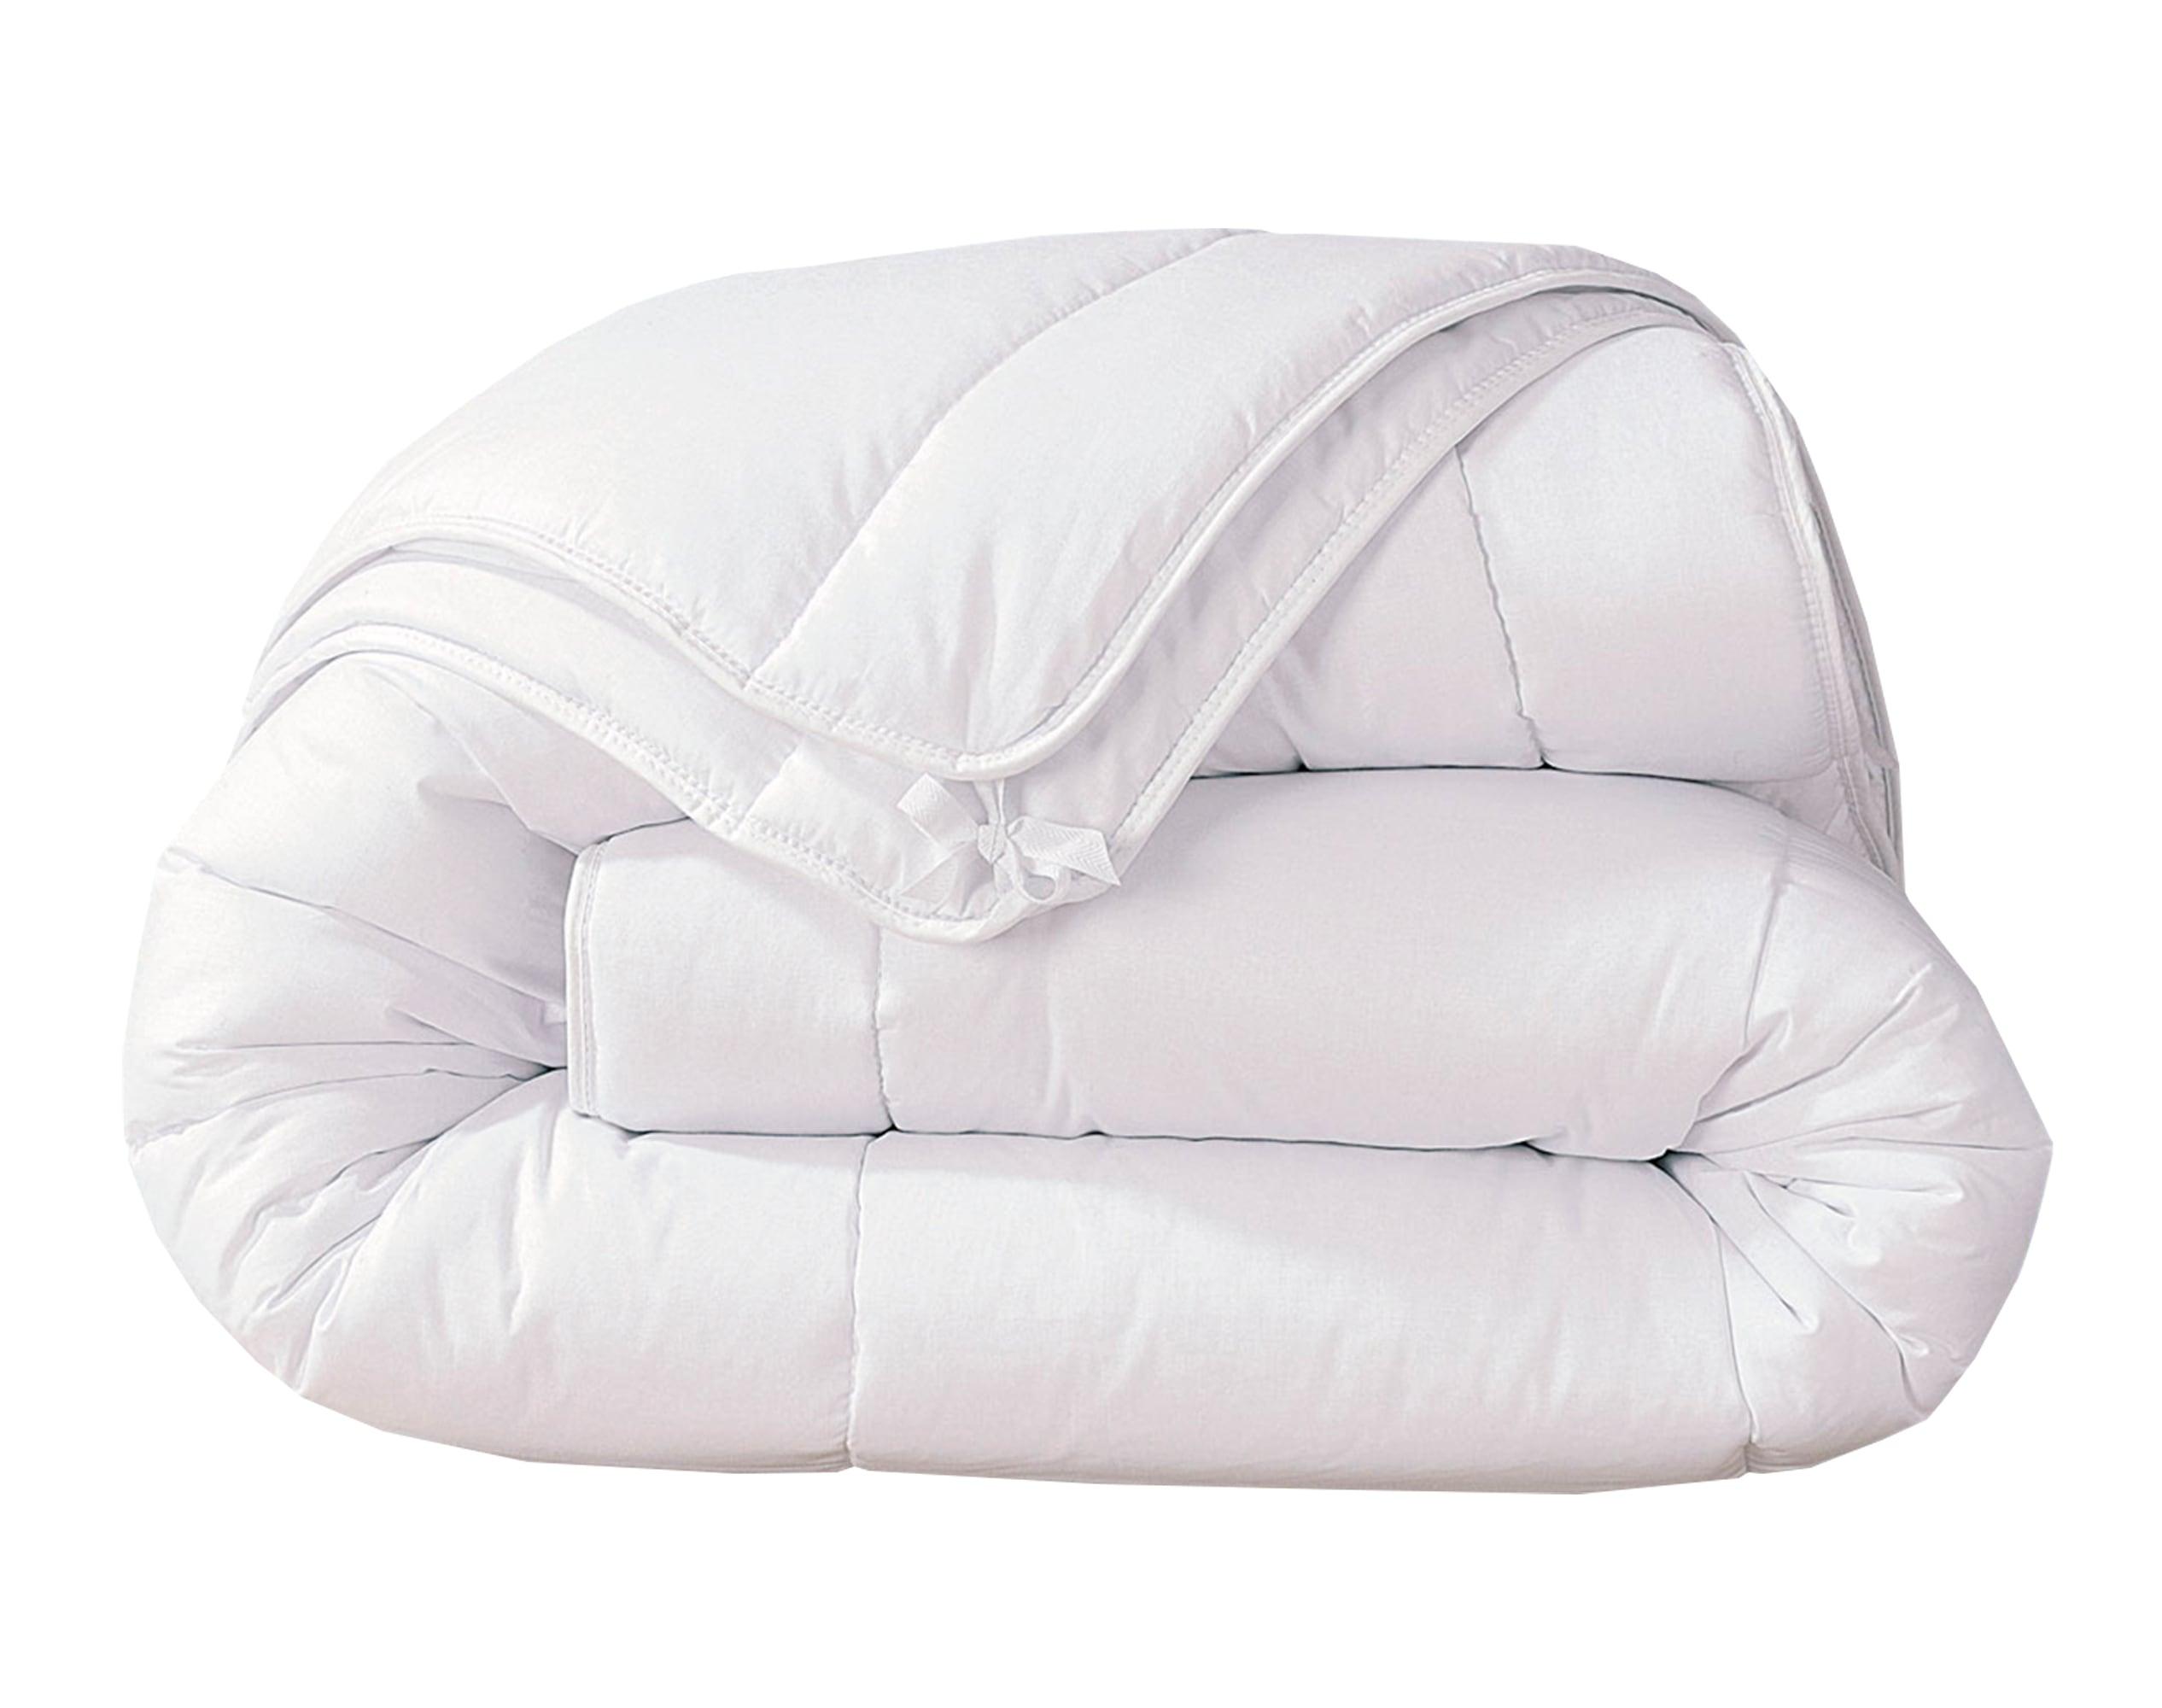 Couette 4 saisons 260x240 blanche en polyester 200+300 g/m²